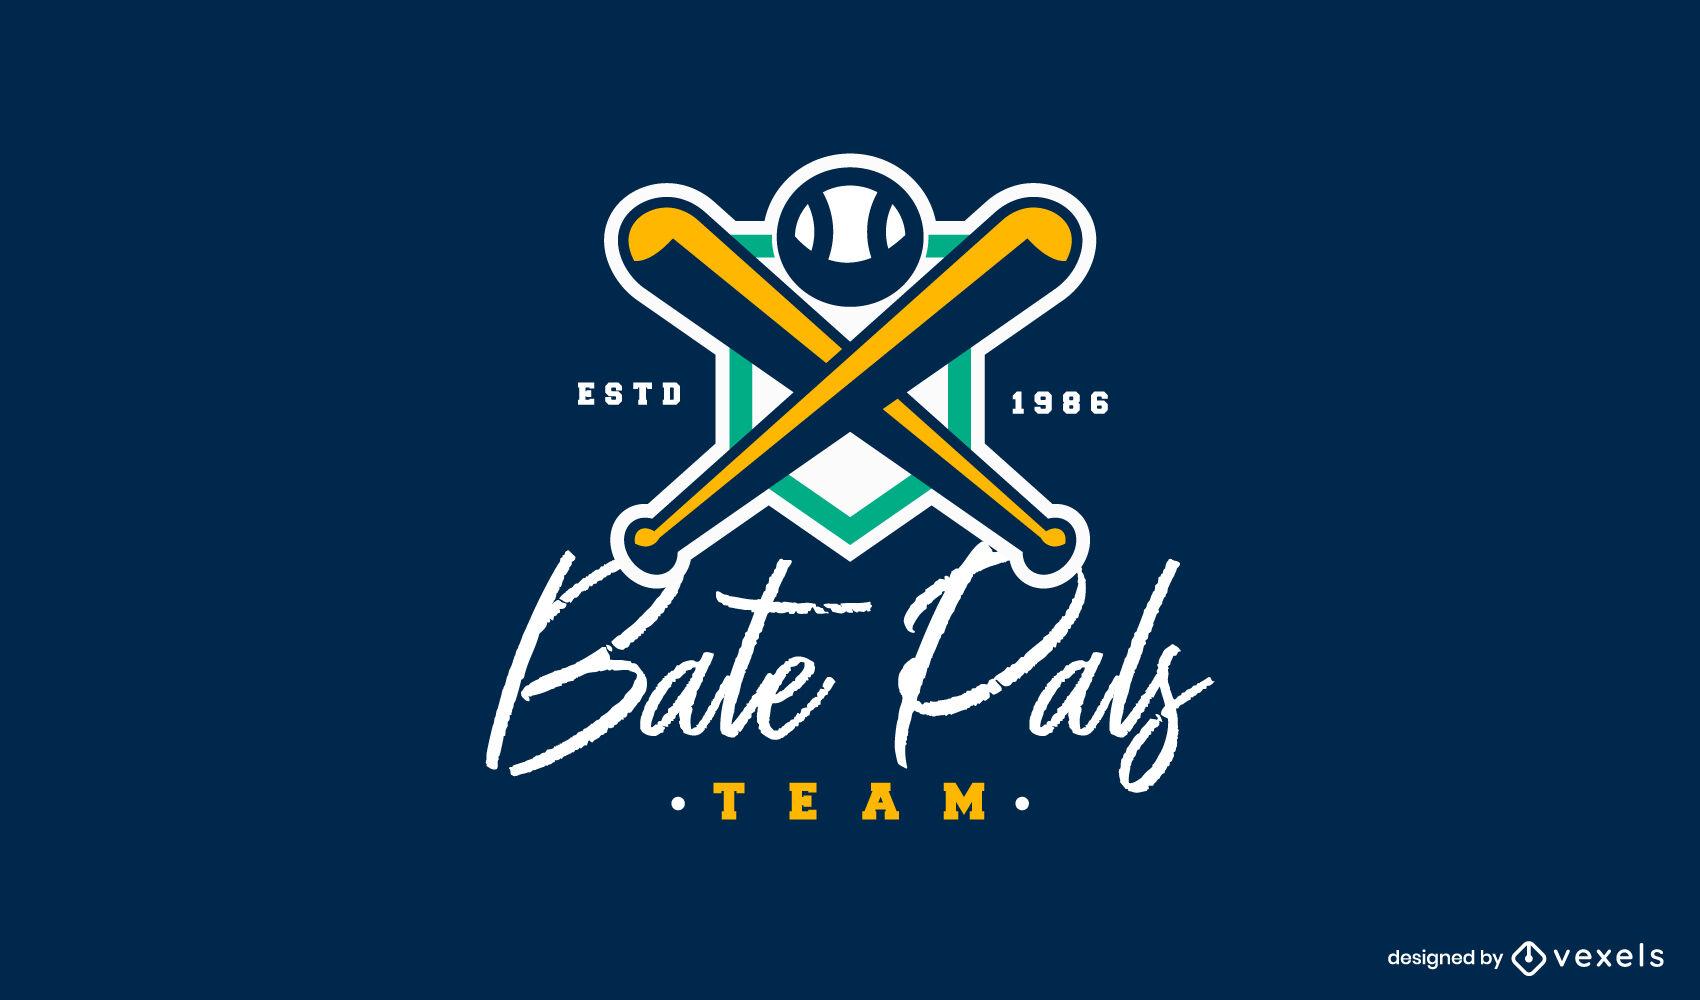 Traço colorido do logotipo do time de beisebol